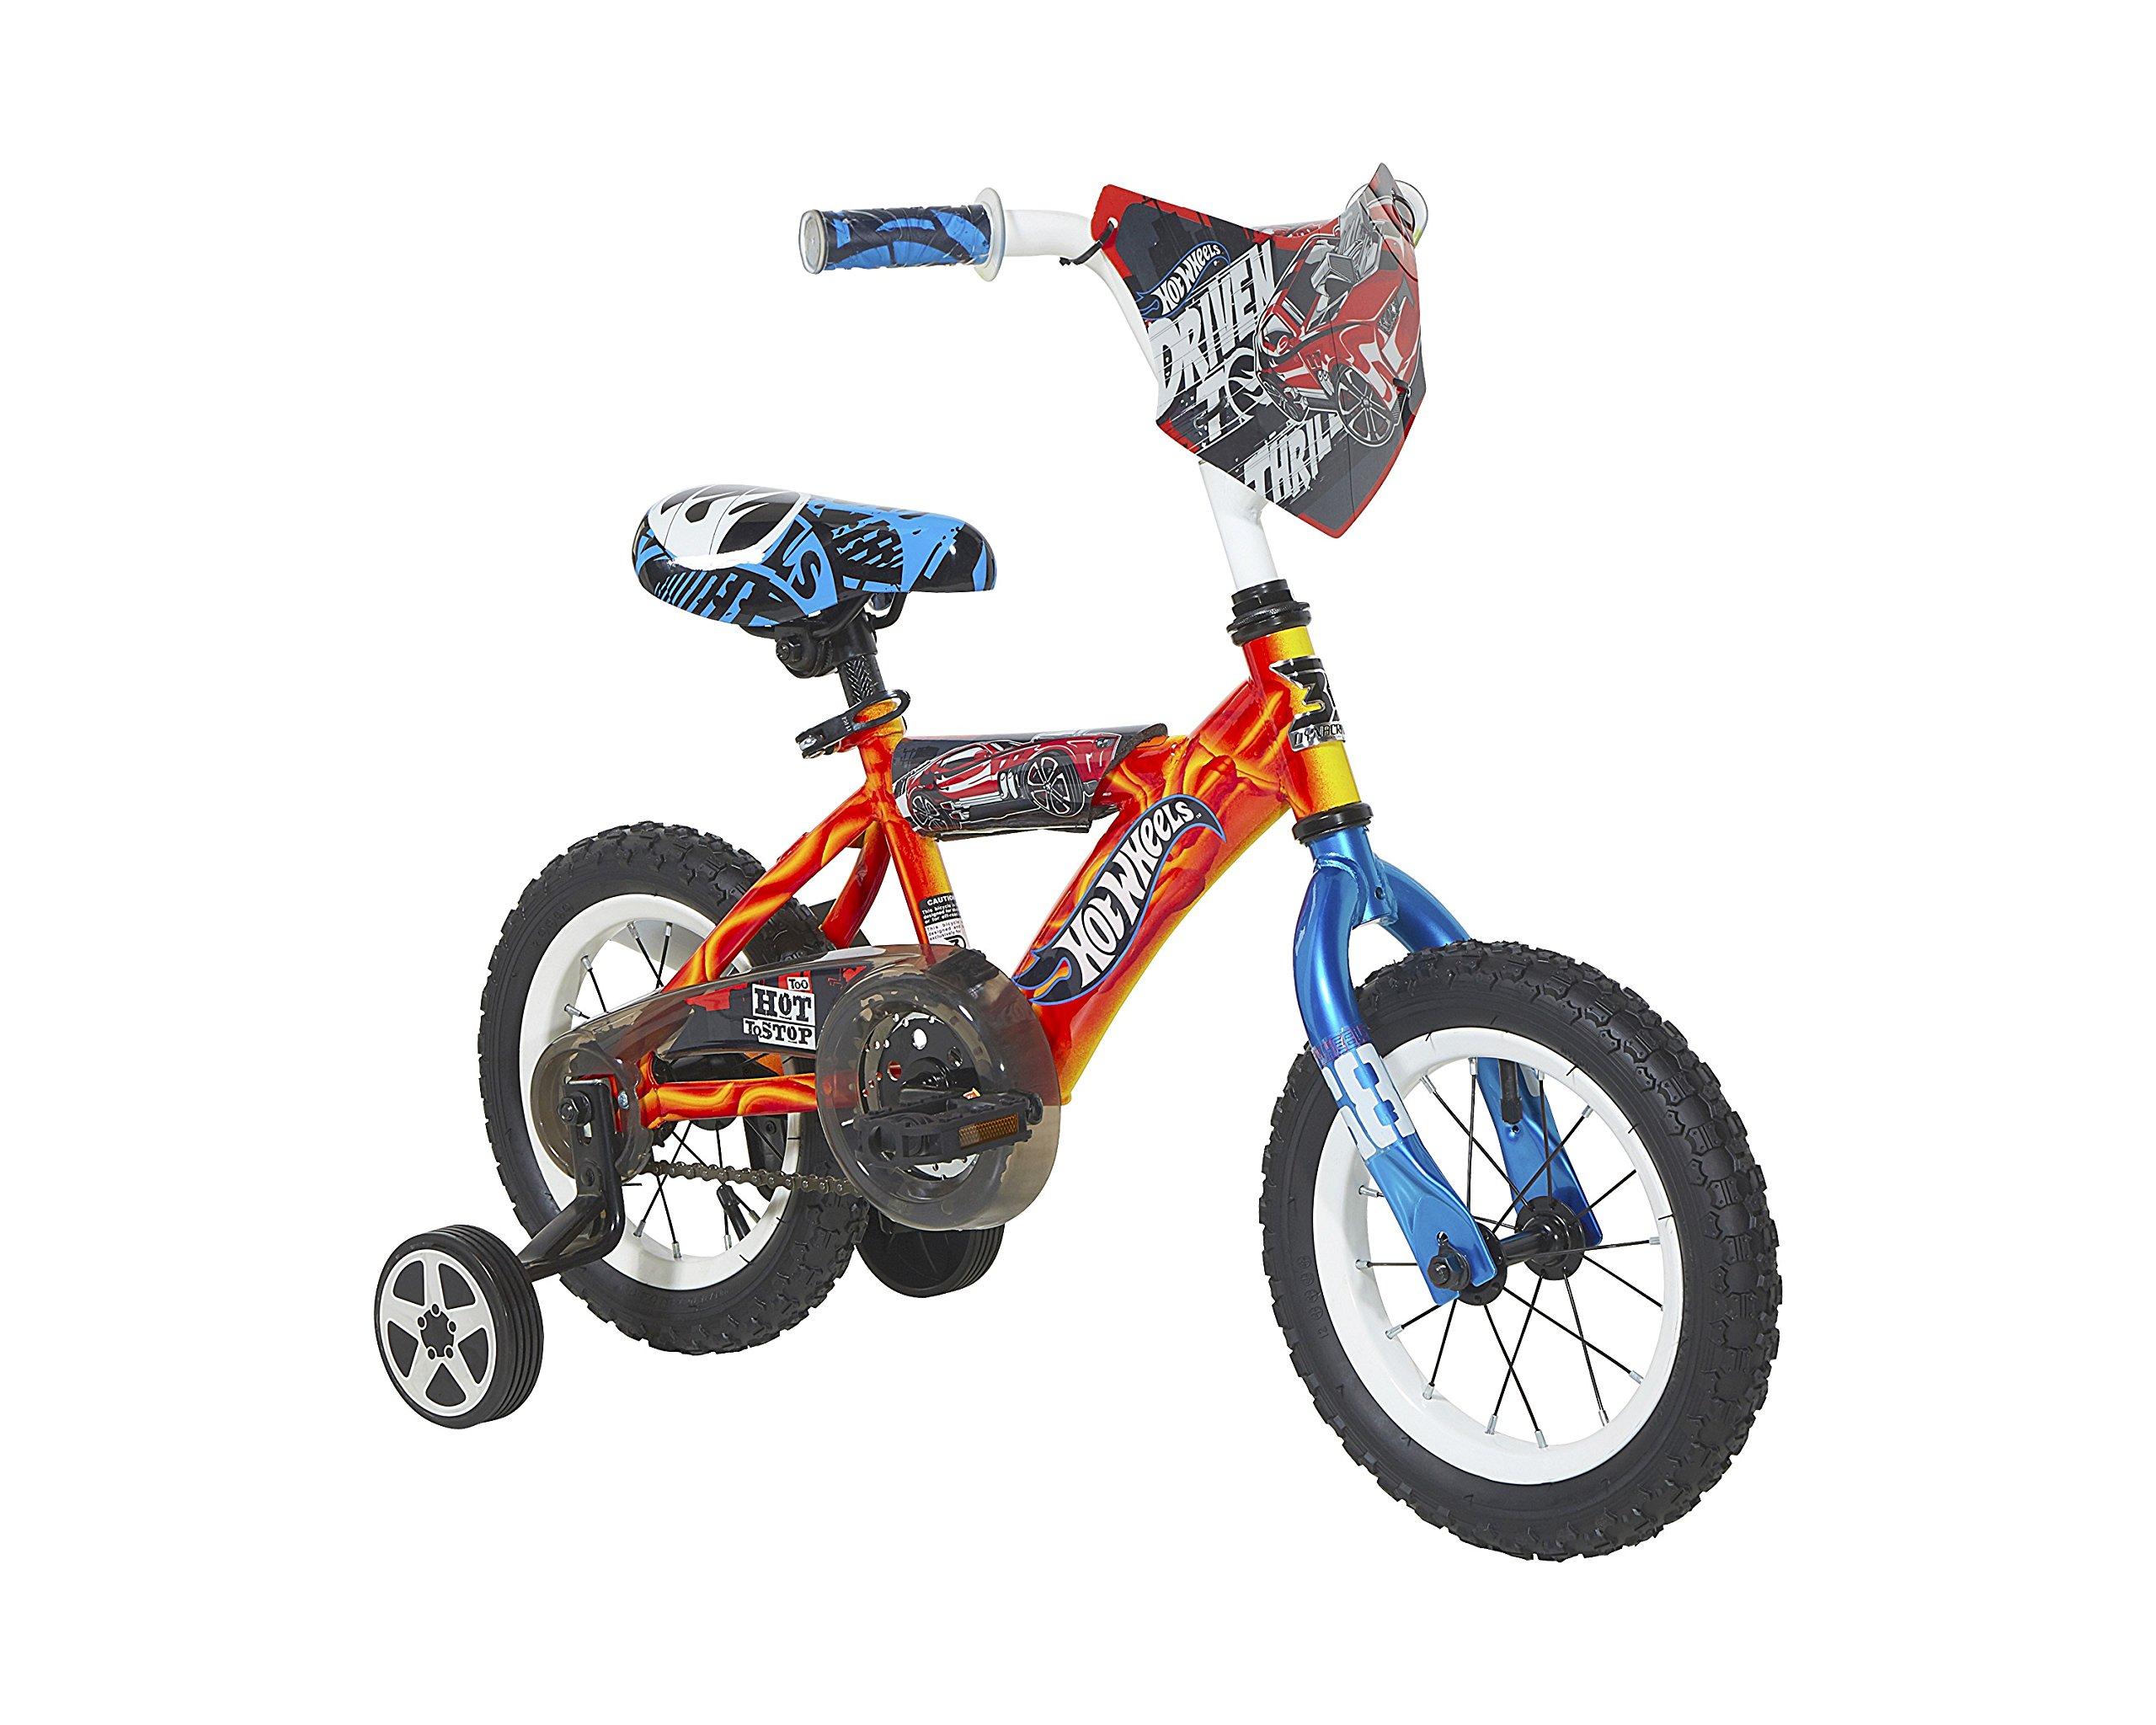 Hot Wheels Boys Dynacraft Bike with Turbospoke, 12'', Red/Blue/Black